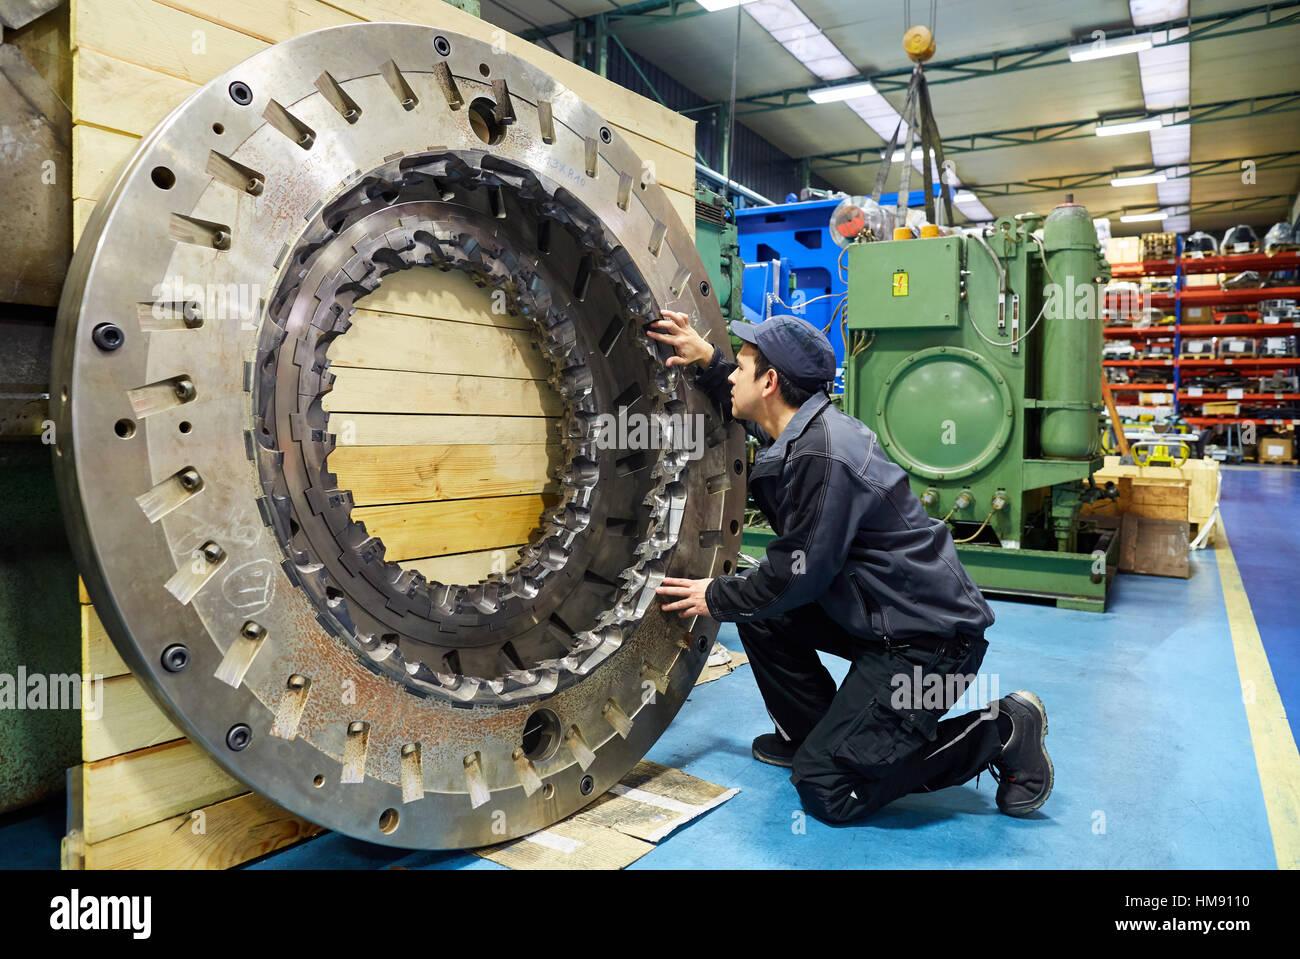 Turnmill lathe. Retrofitting. Machining Center. CNC. Design, manufacture and installation of machine tools. Bost - Stock Image